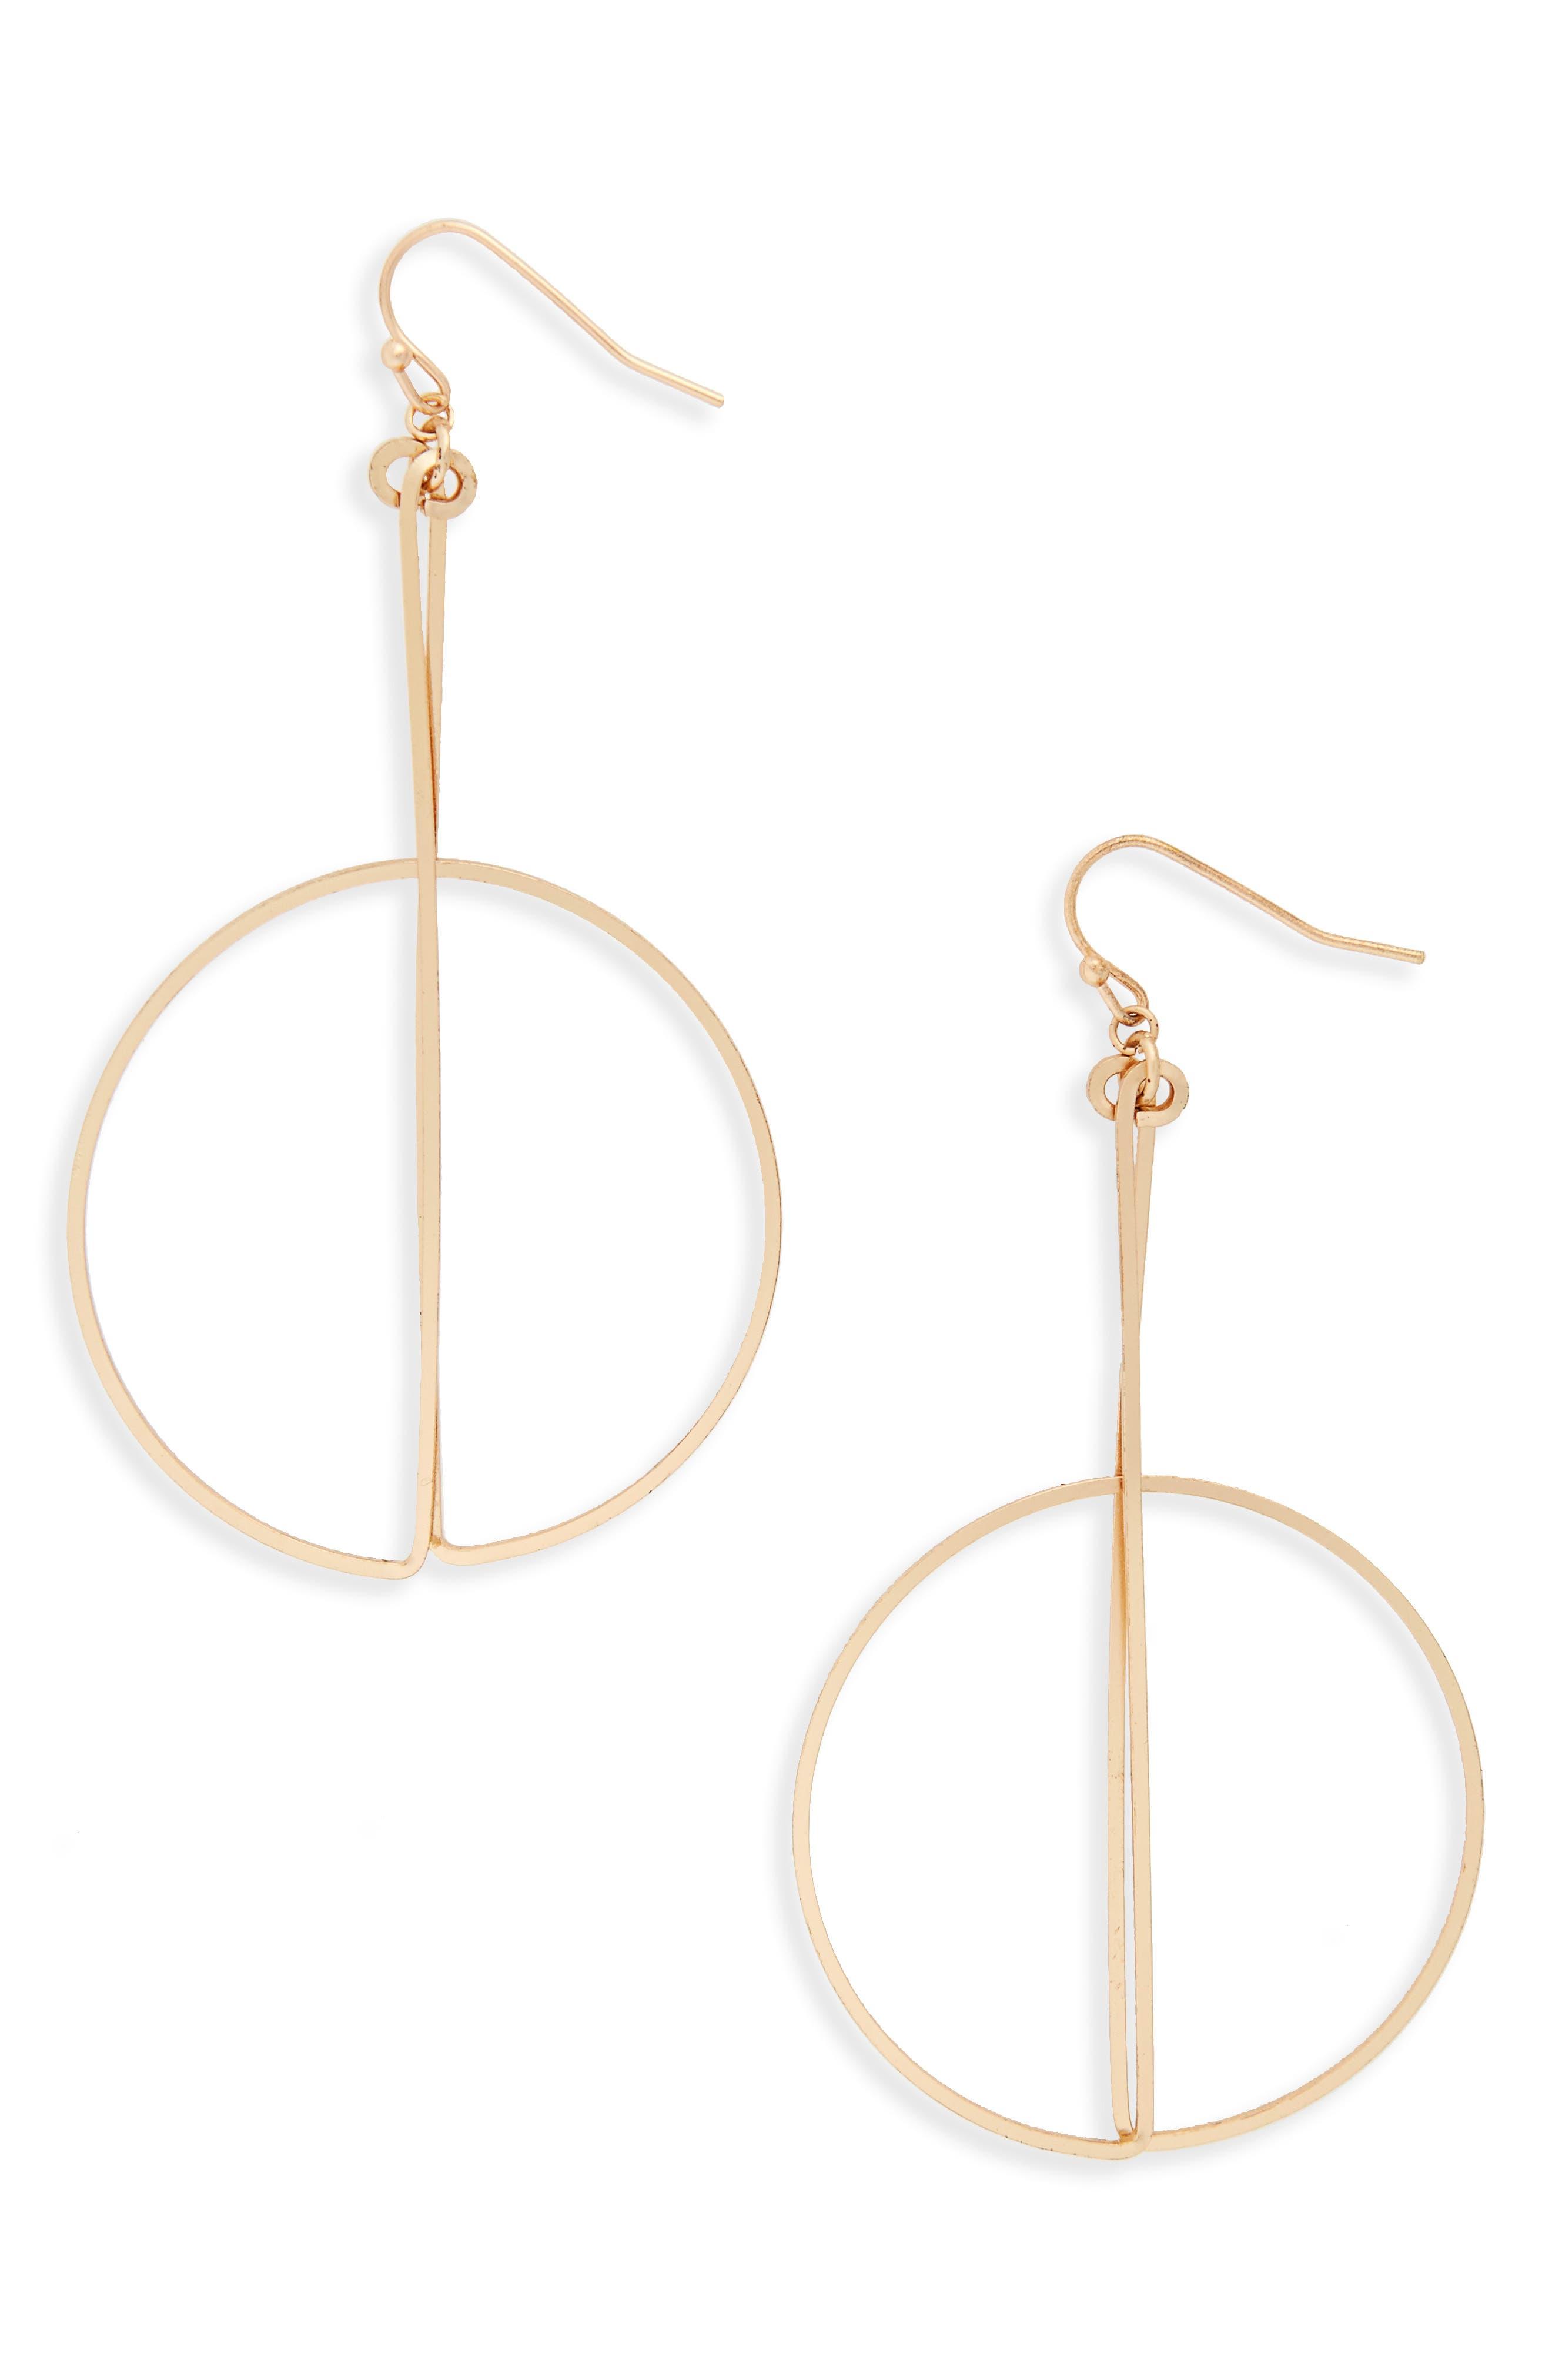 Alternate Image 1 Selected - BP. Circle and Bar Earrings